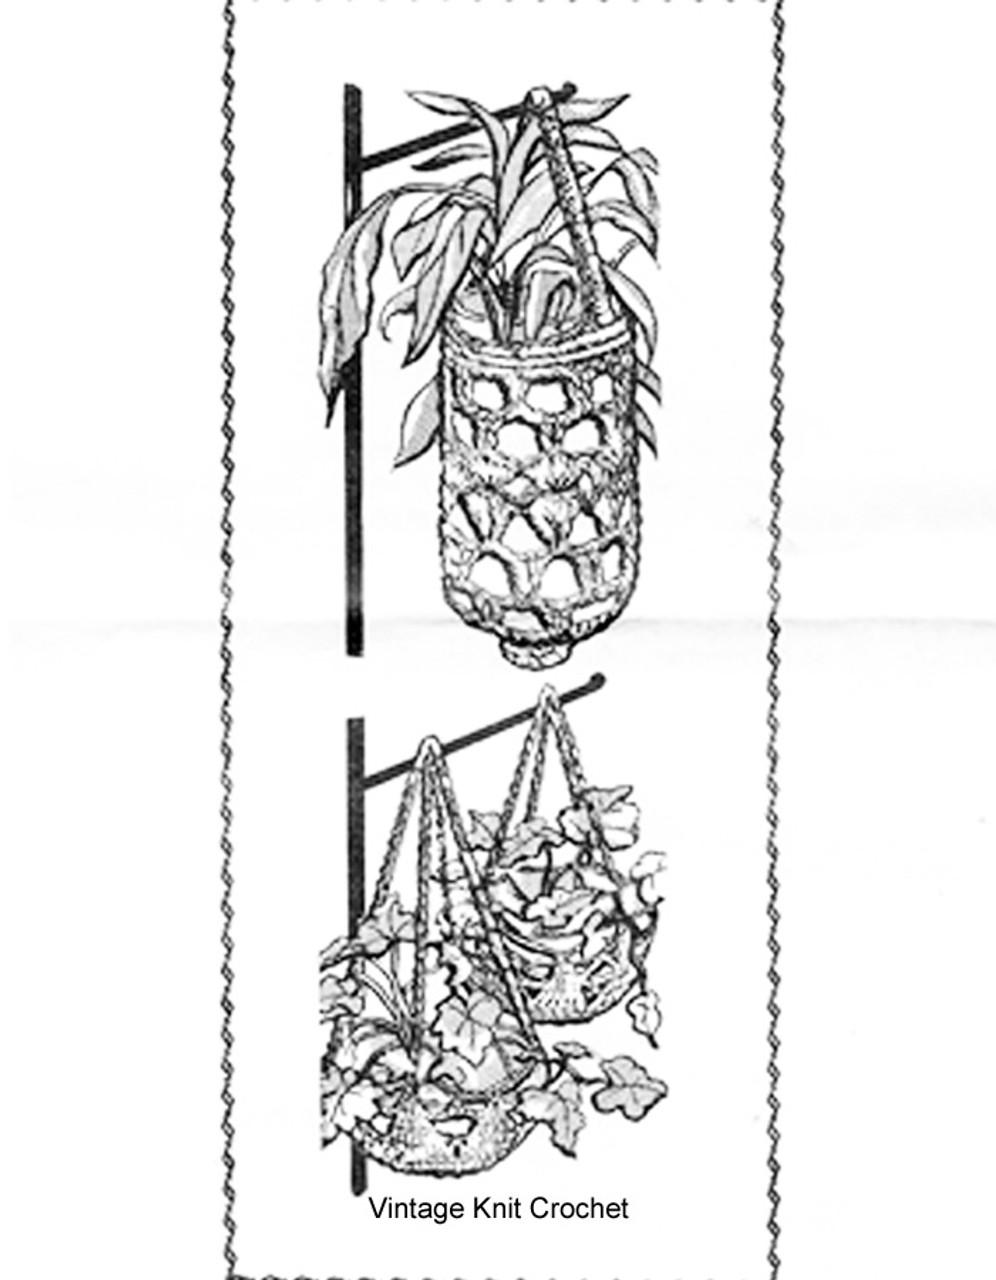 Mail Order Crocheted Baskets Pattern Design 865